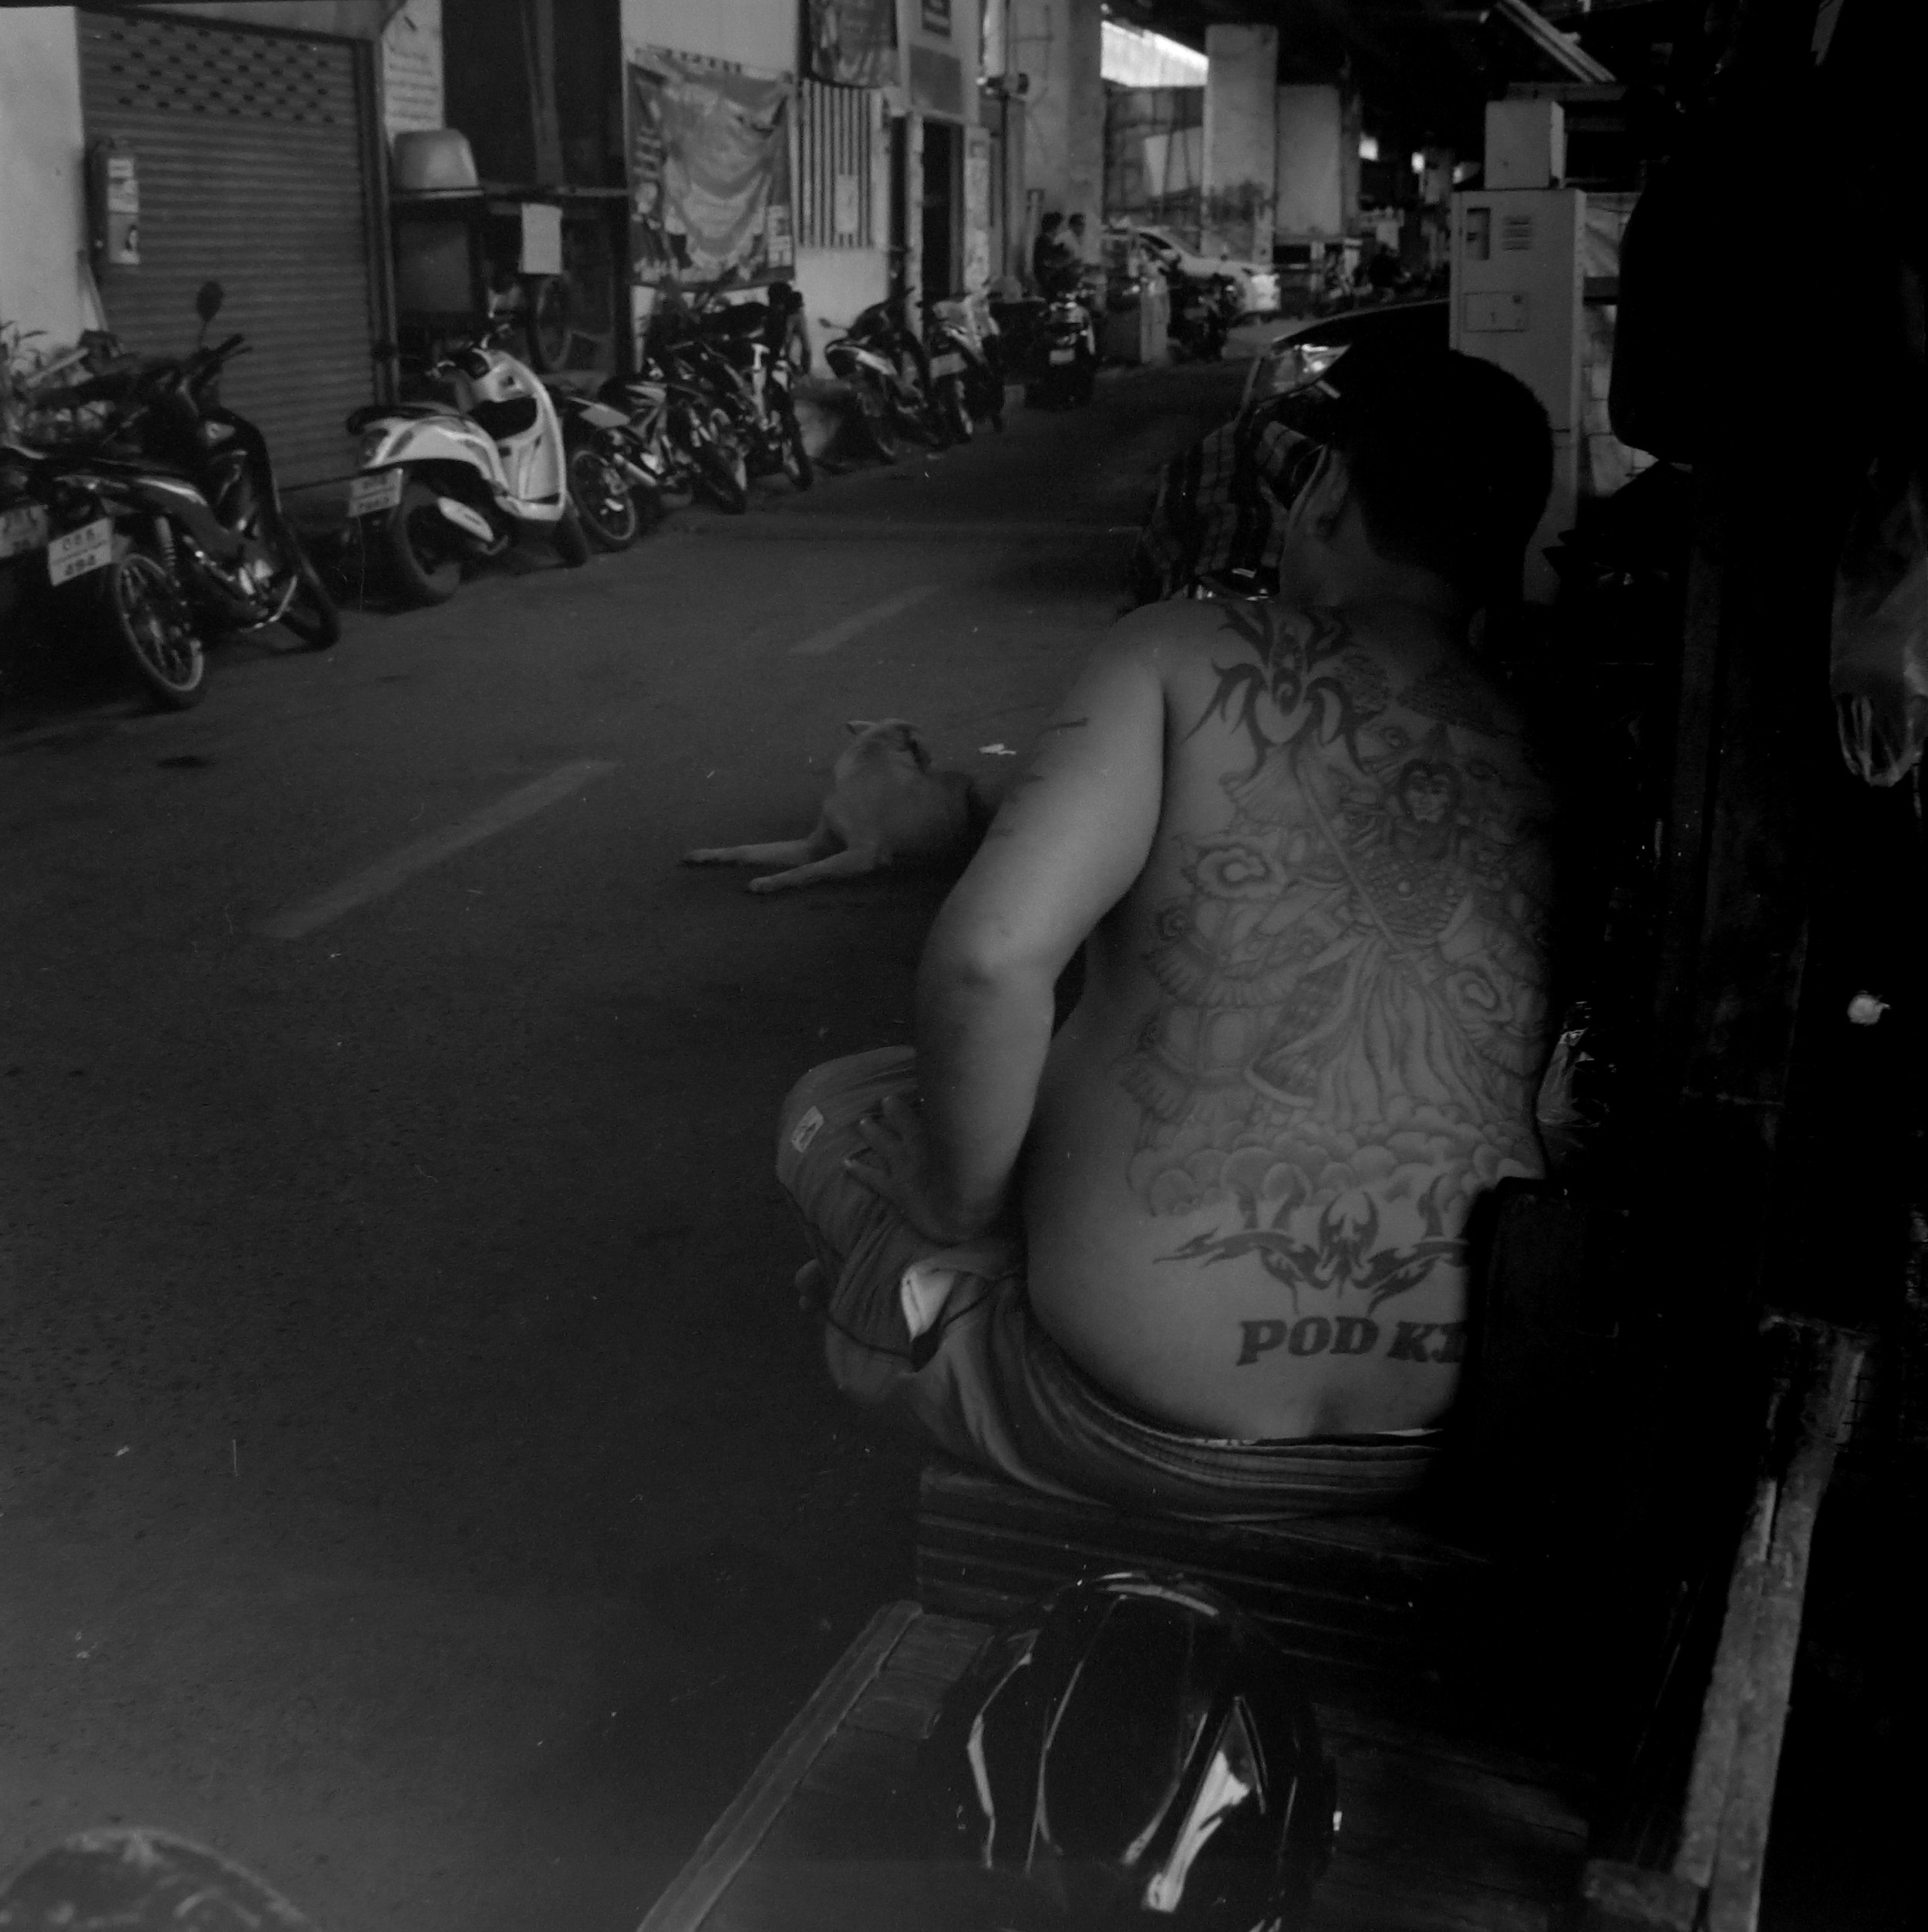 chromacomaphoto bangkok street photography rolleiflex black white ilford thailand khlong toei slum ghetto (2).JPG